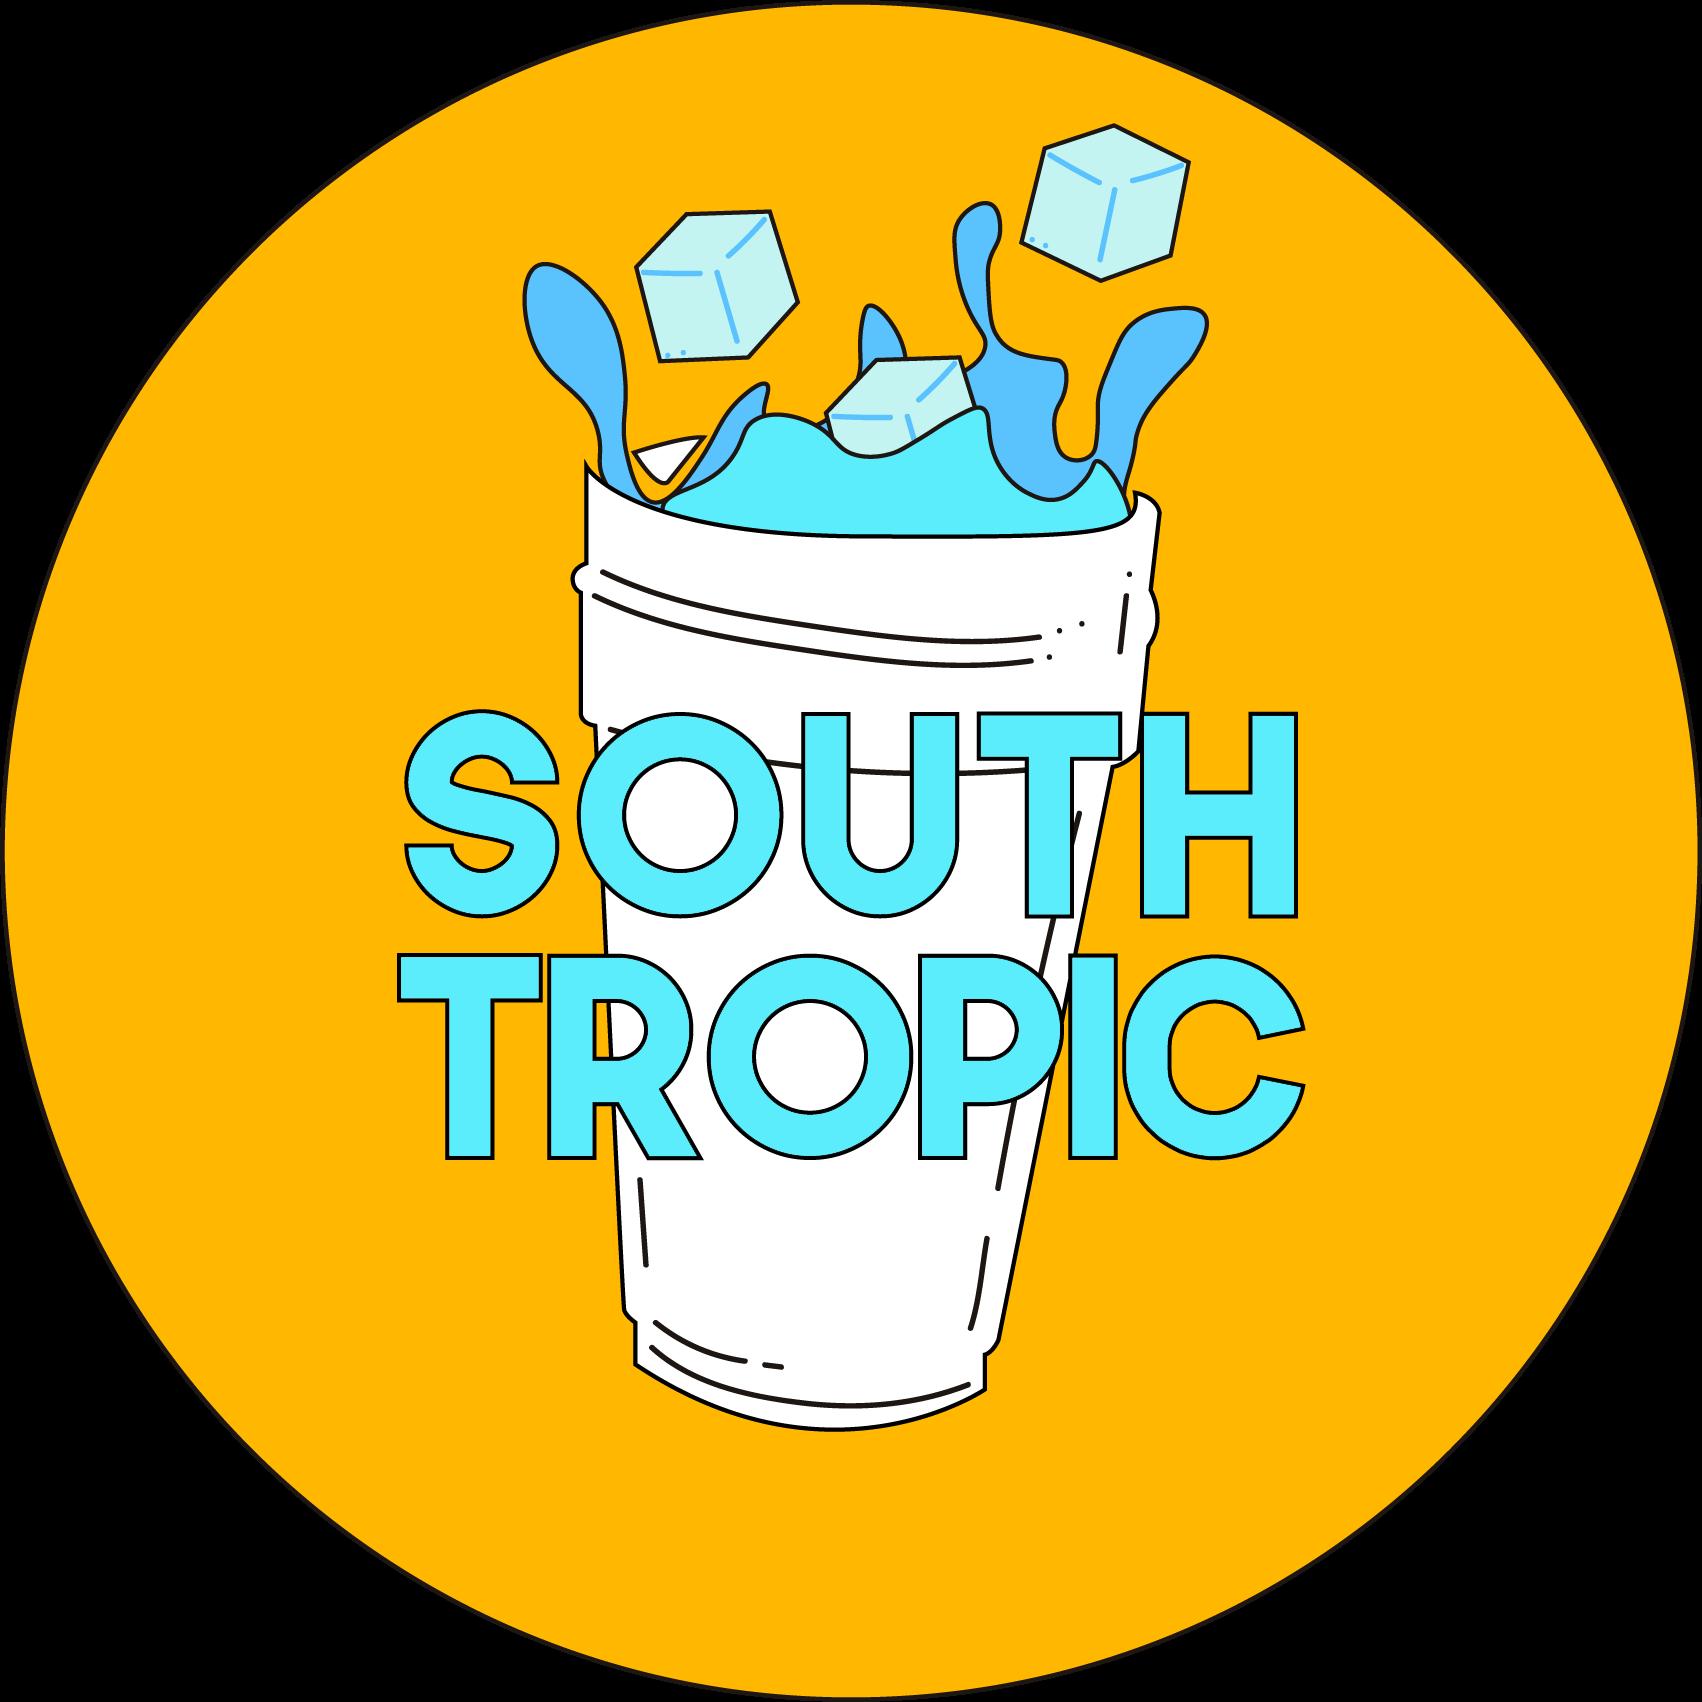 South Tropic